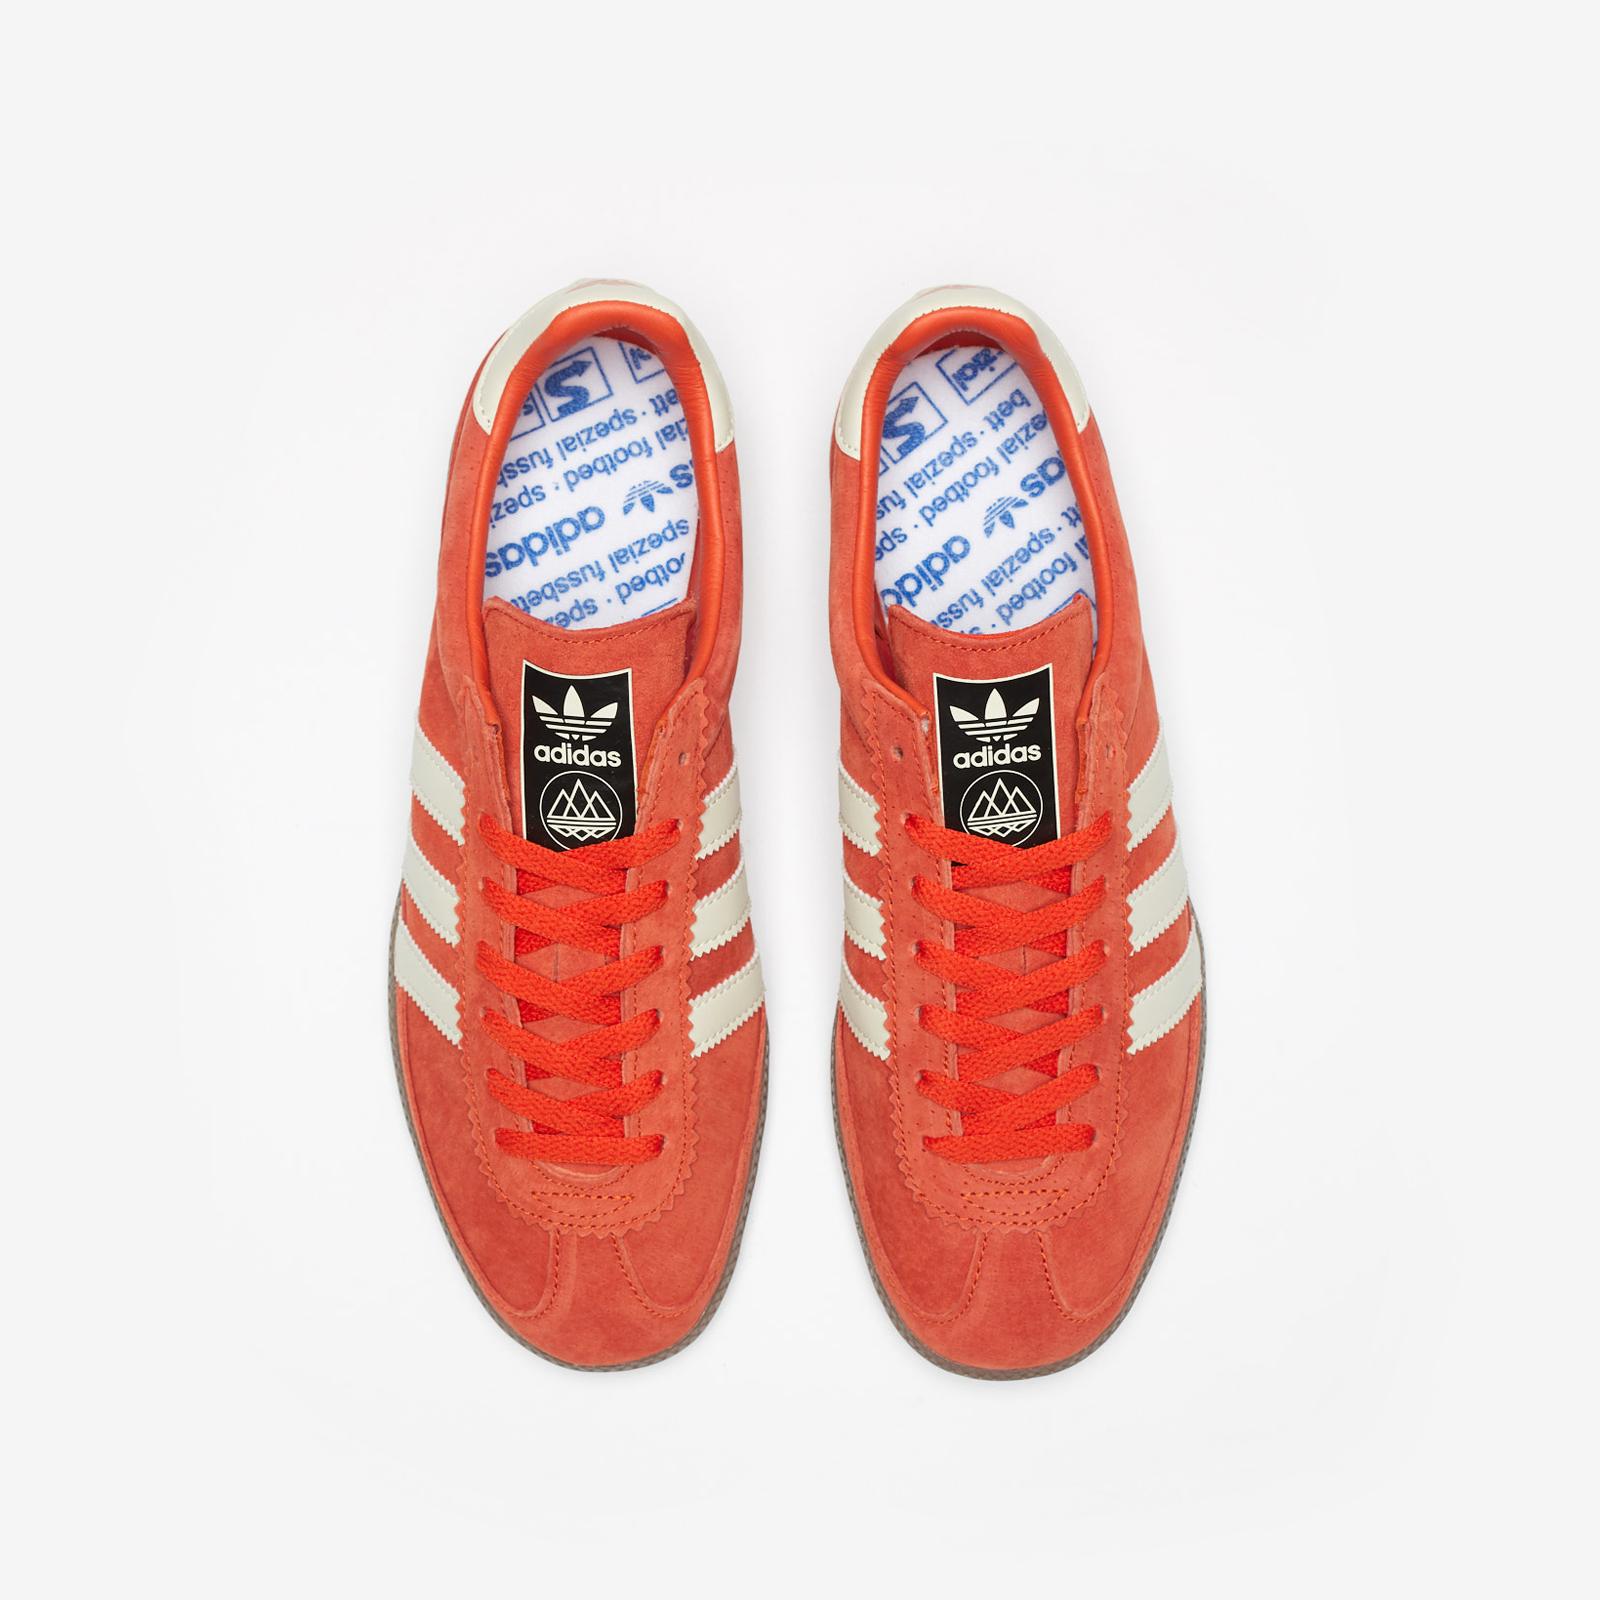 adidas Whalley - F35716